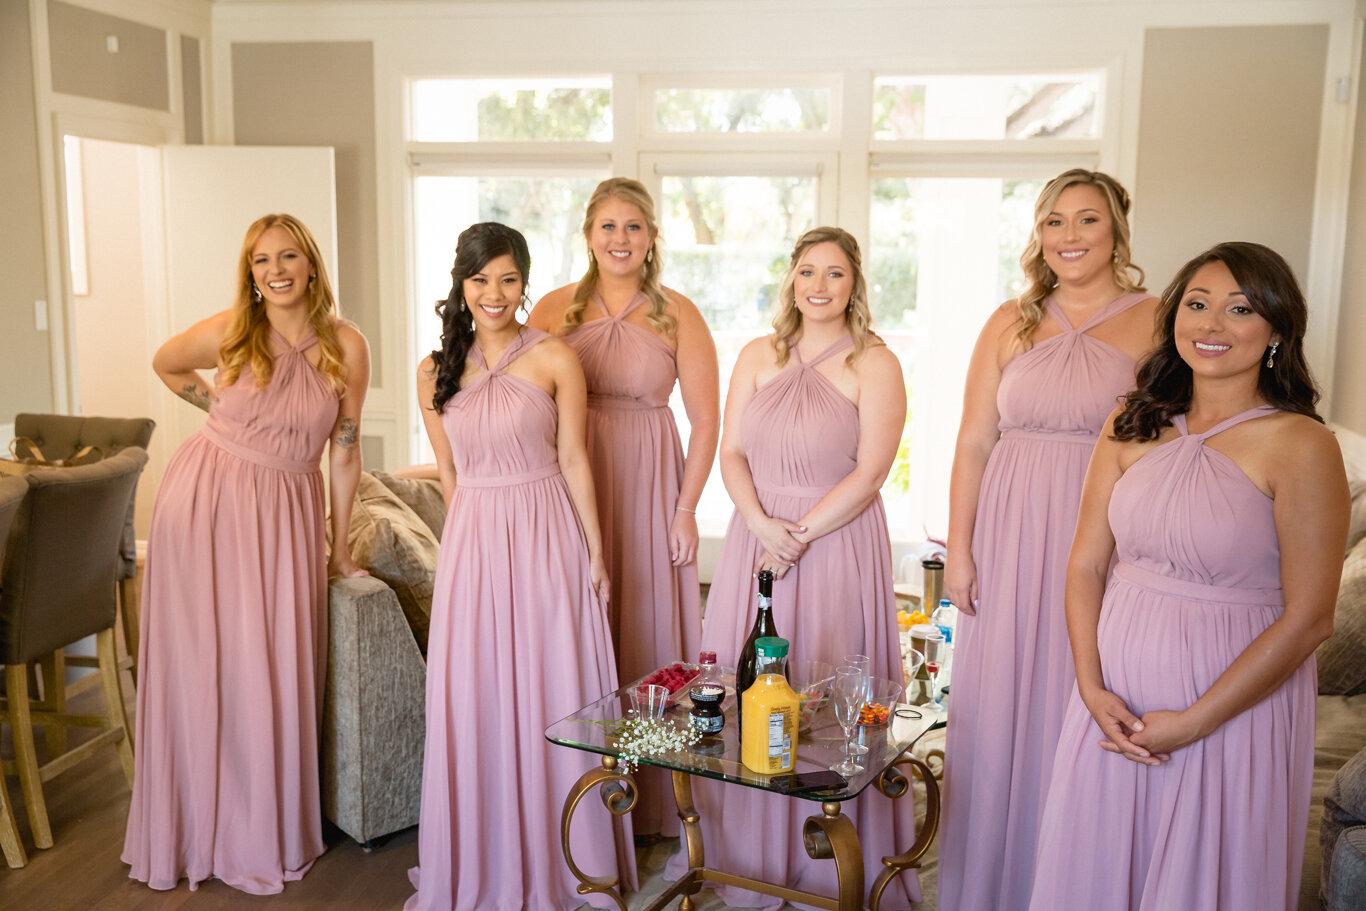 2019.08.24_Emily-Ashir-Wedding-at-the-Maples-5059.jpg